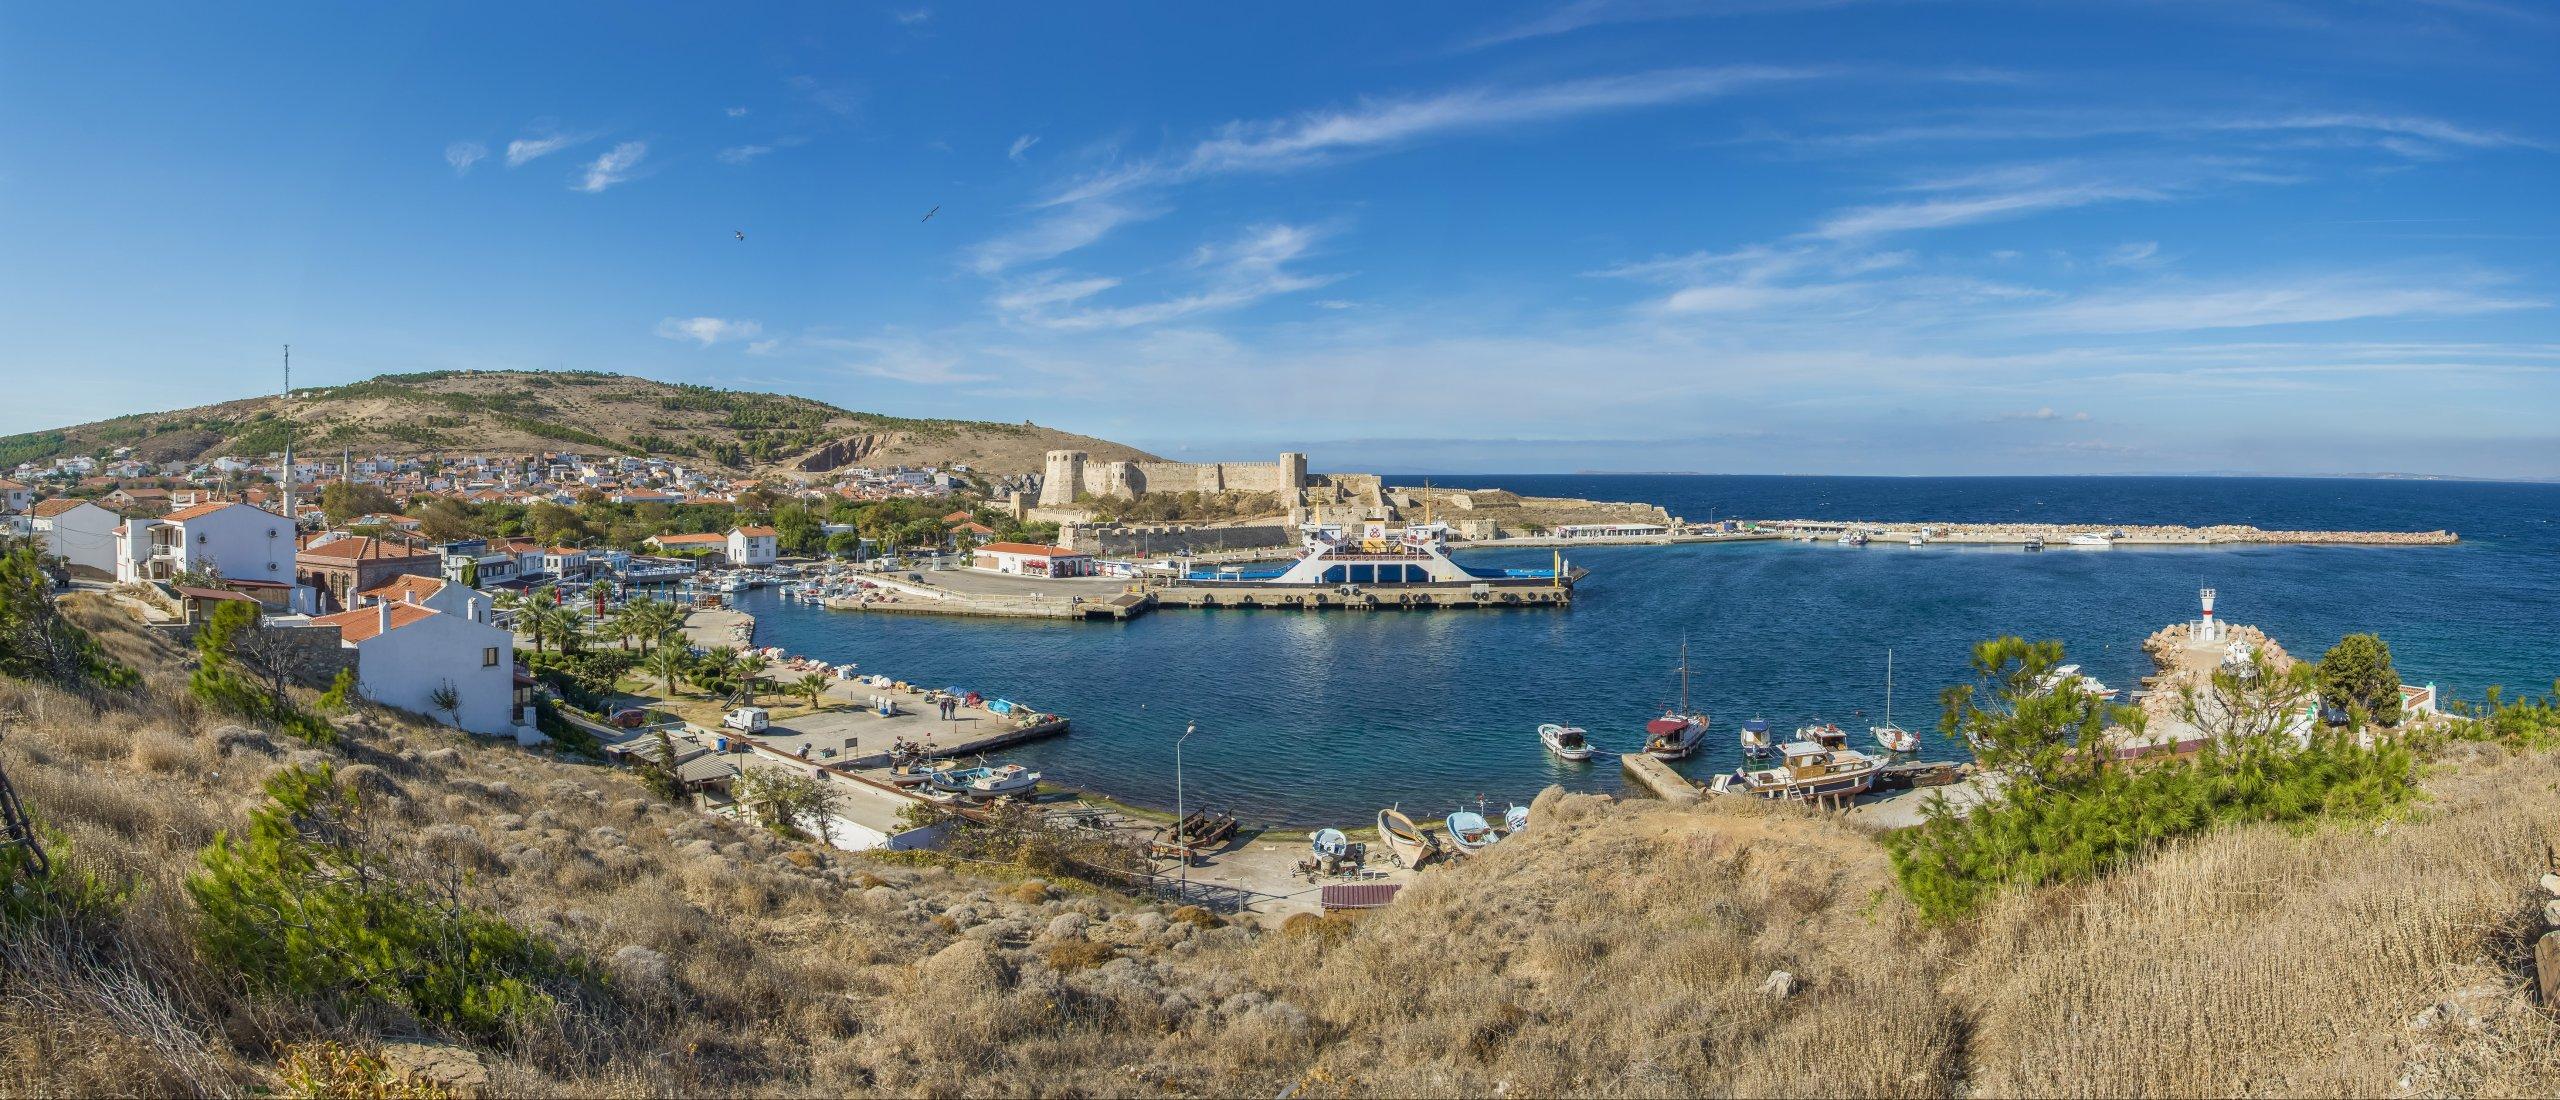 The festival normally takes place in Bozaada island. (Shutterstock Photo)